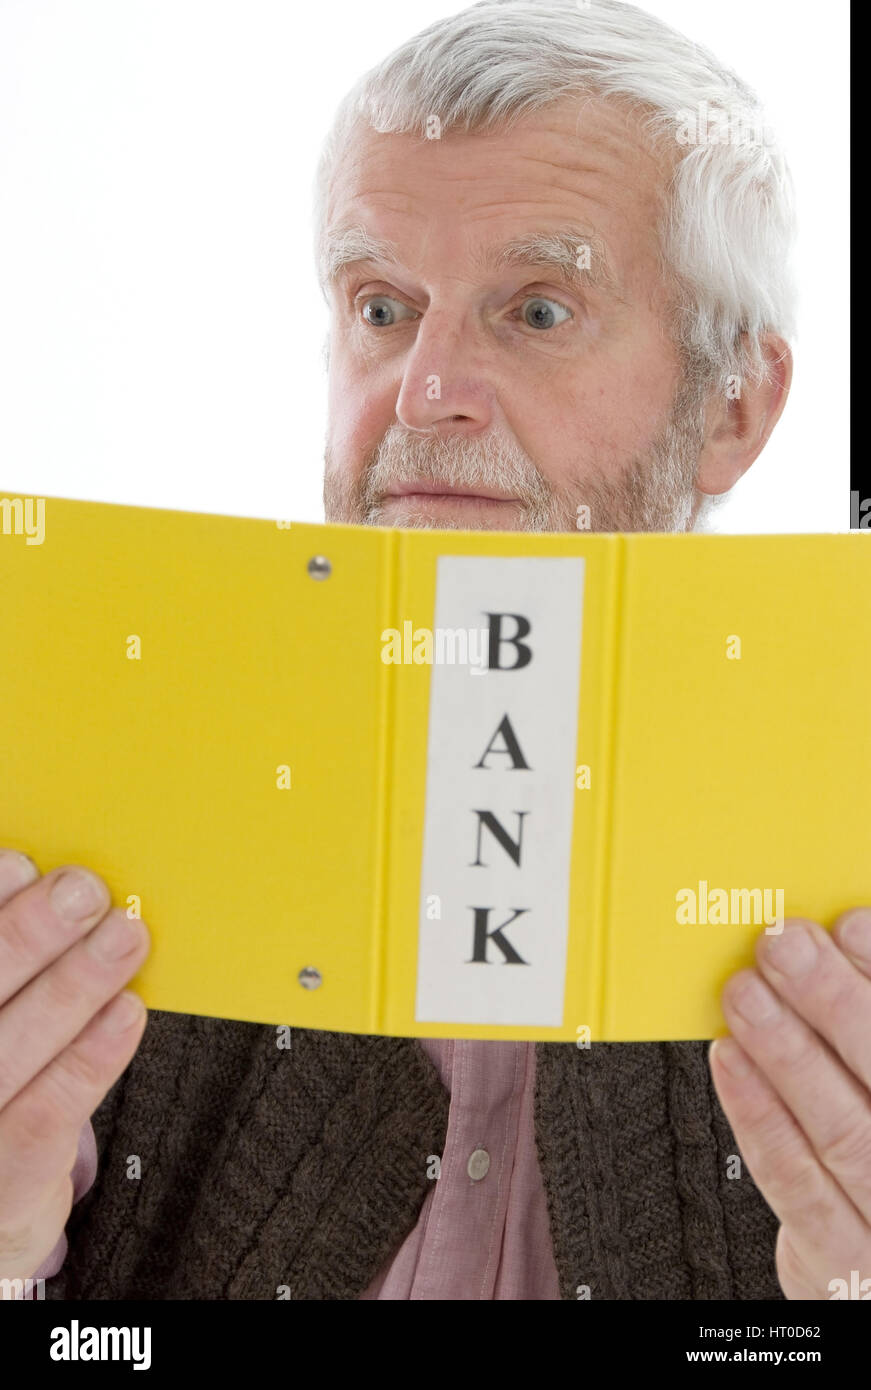 Geschockter Pensionist schaut sich Bankbelege an - retiree with bank accounts - Stock Image